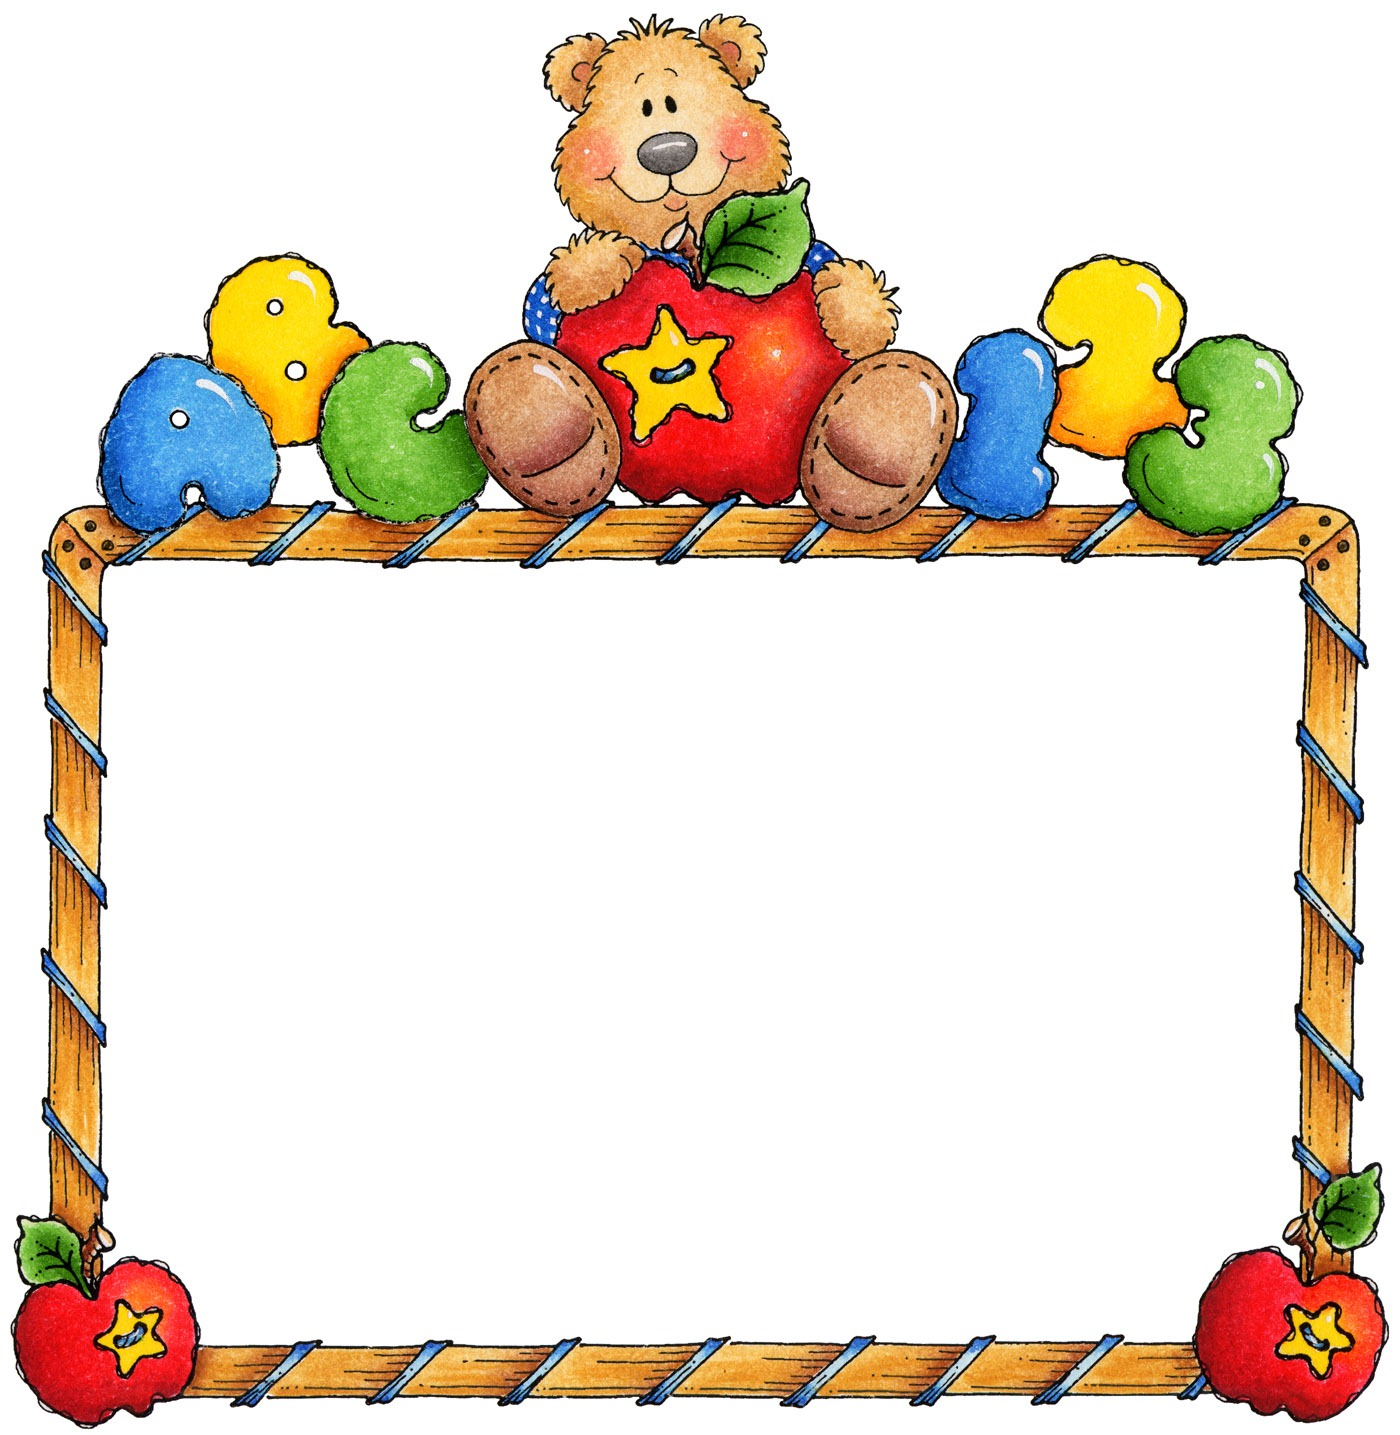 Preschool Border Clipart | Free download on ClipArtMag